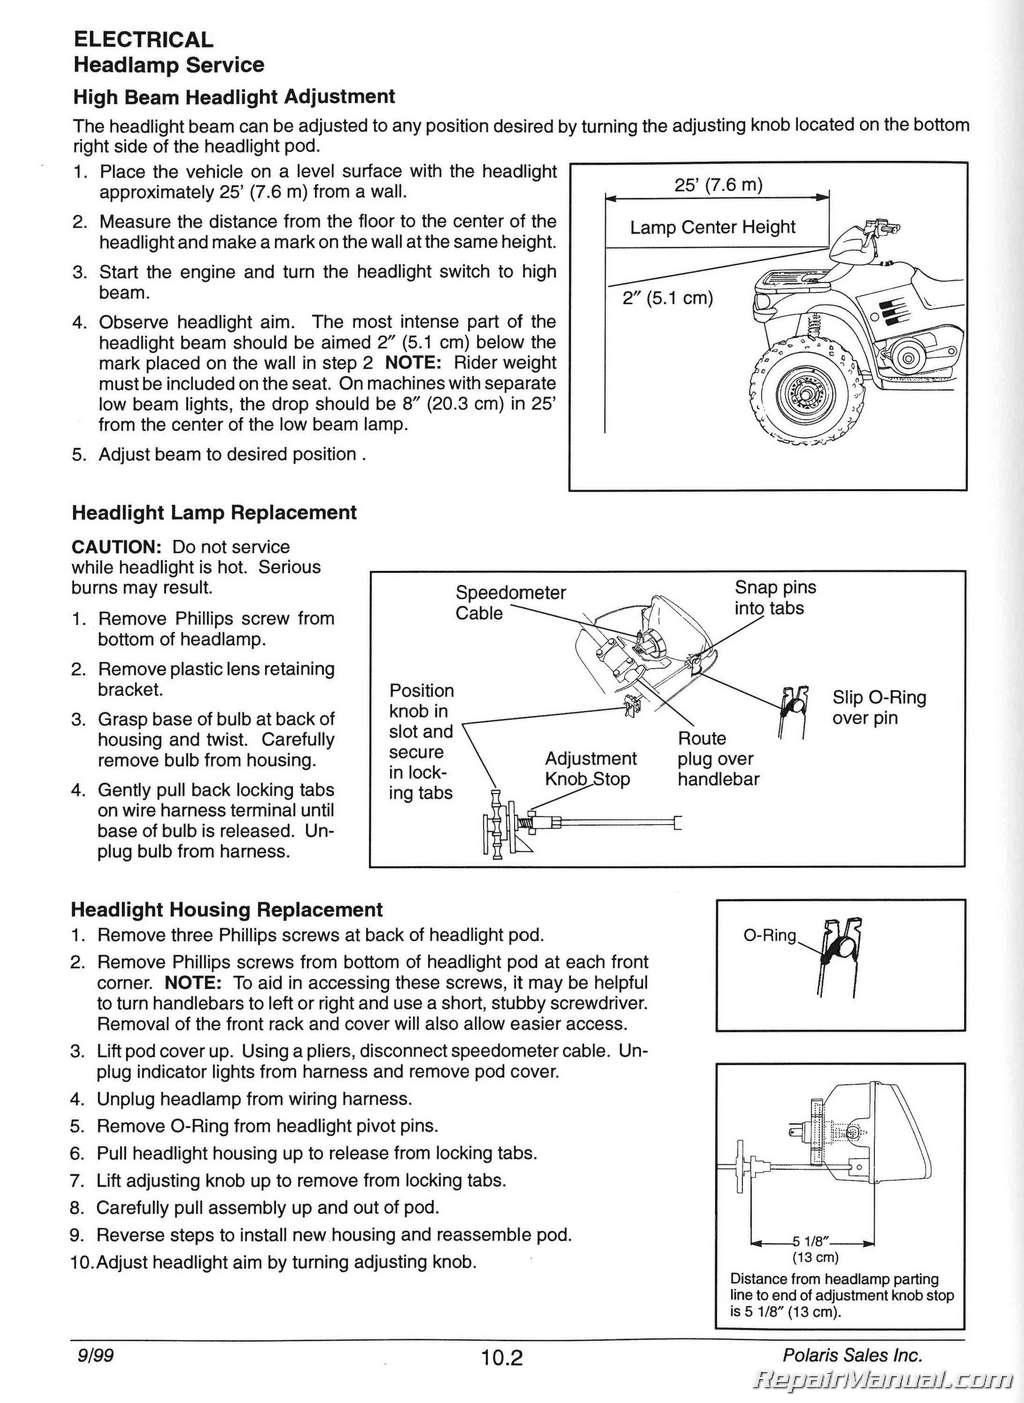 polaris hud instruction manual